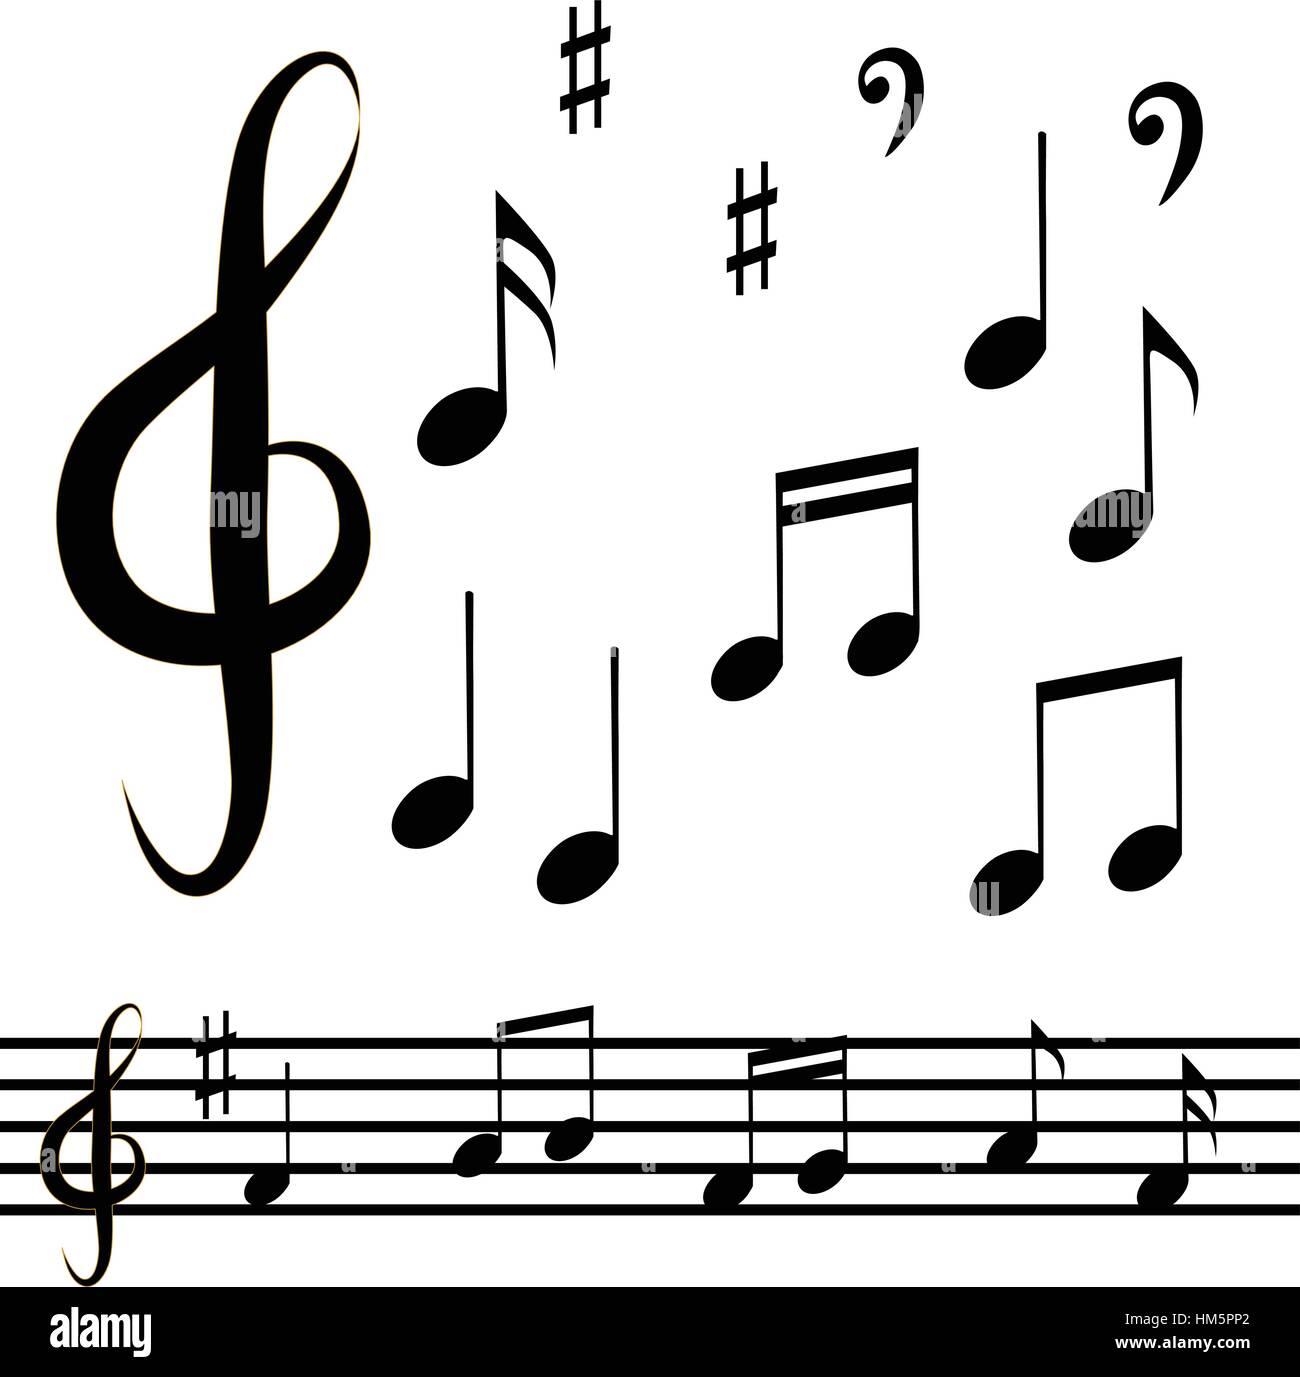 music note background vector eps 10 stock vector art